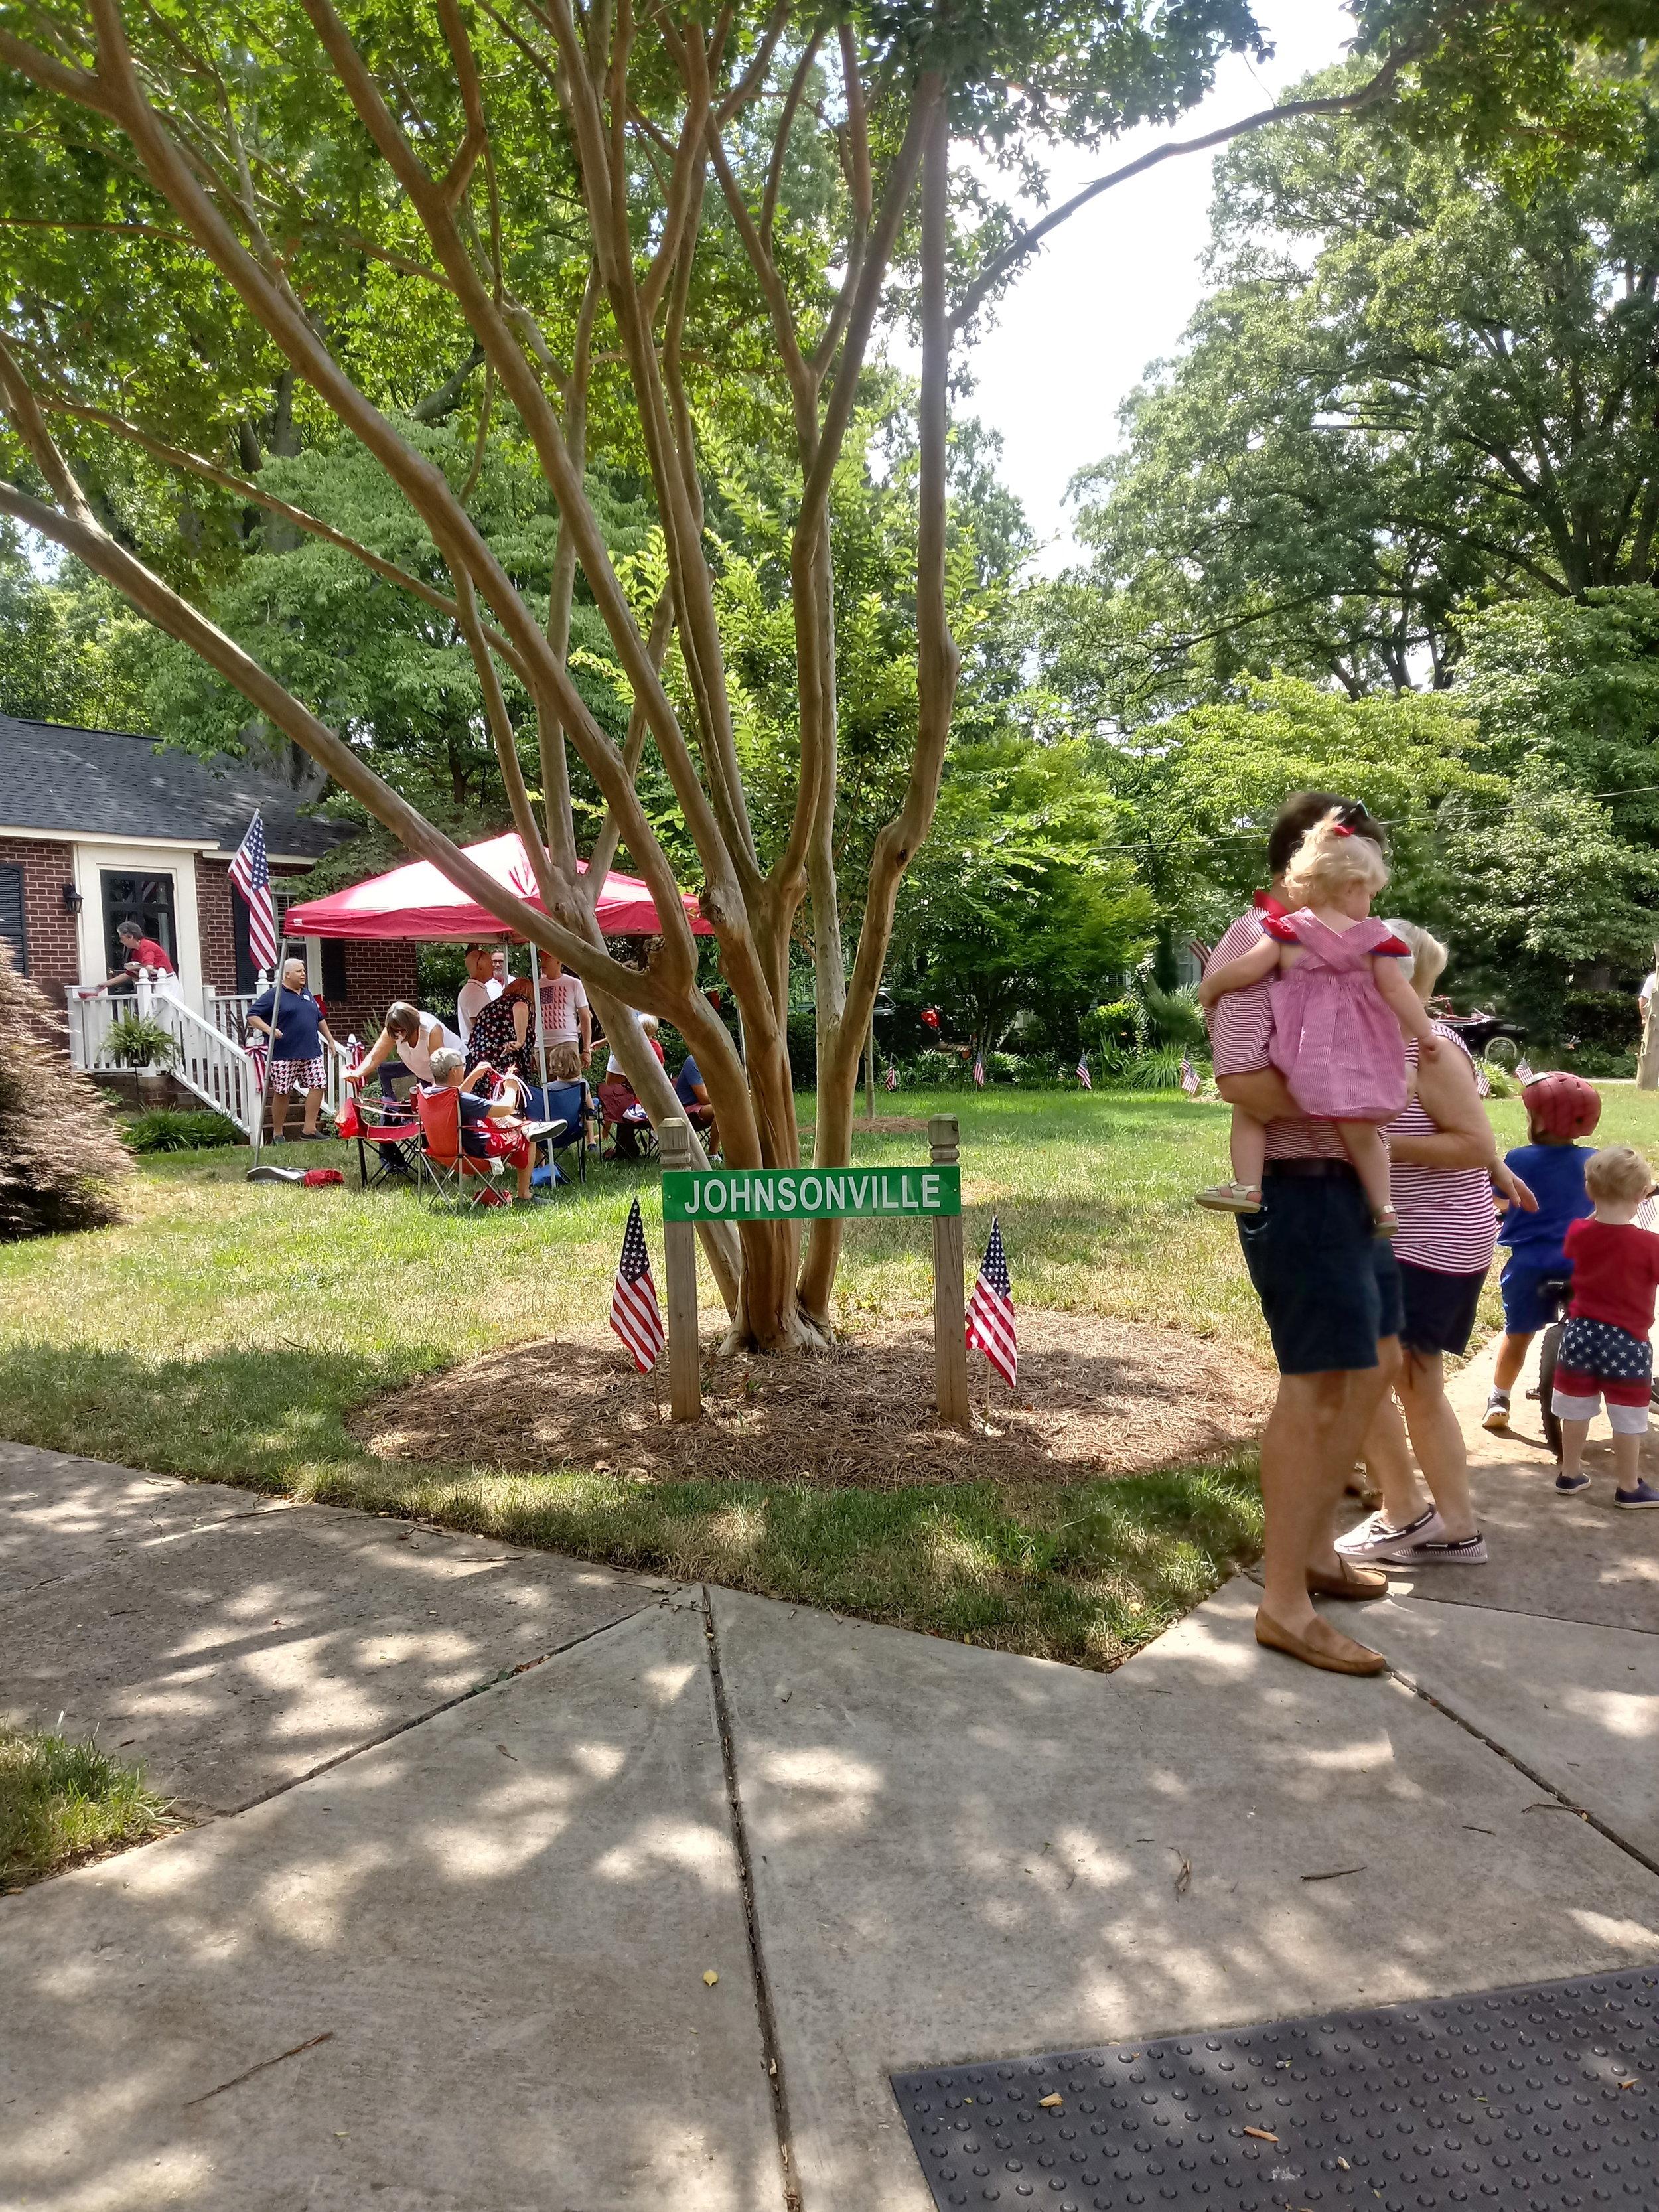 Johnsonville Parade 2018 (2).jpg